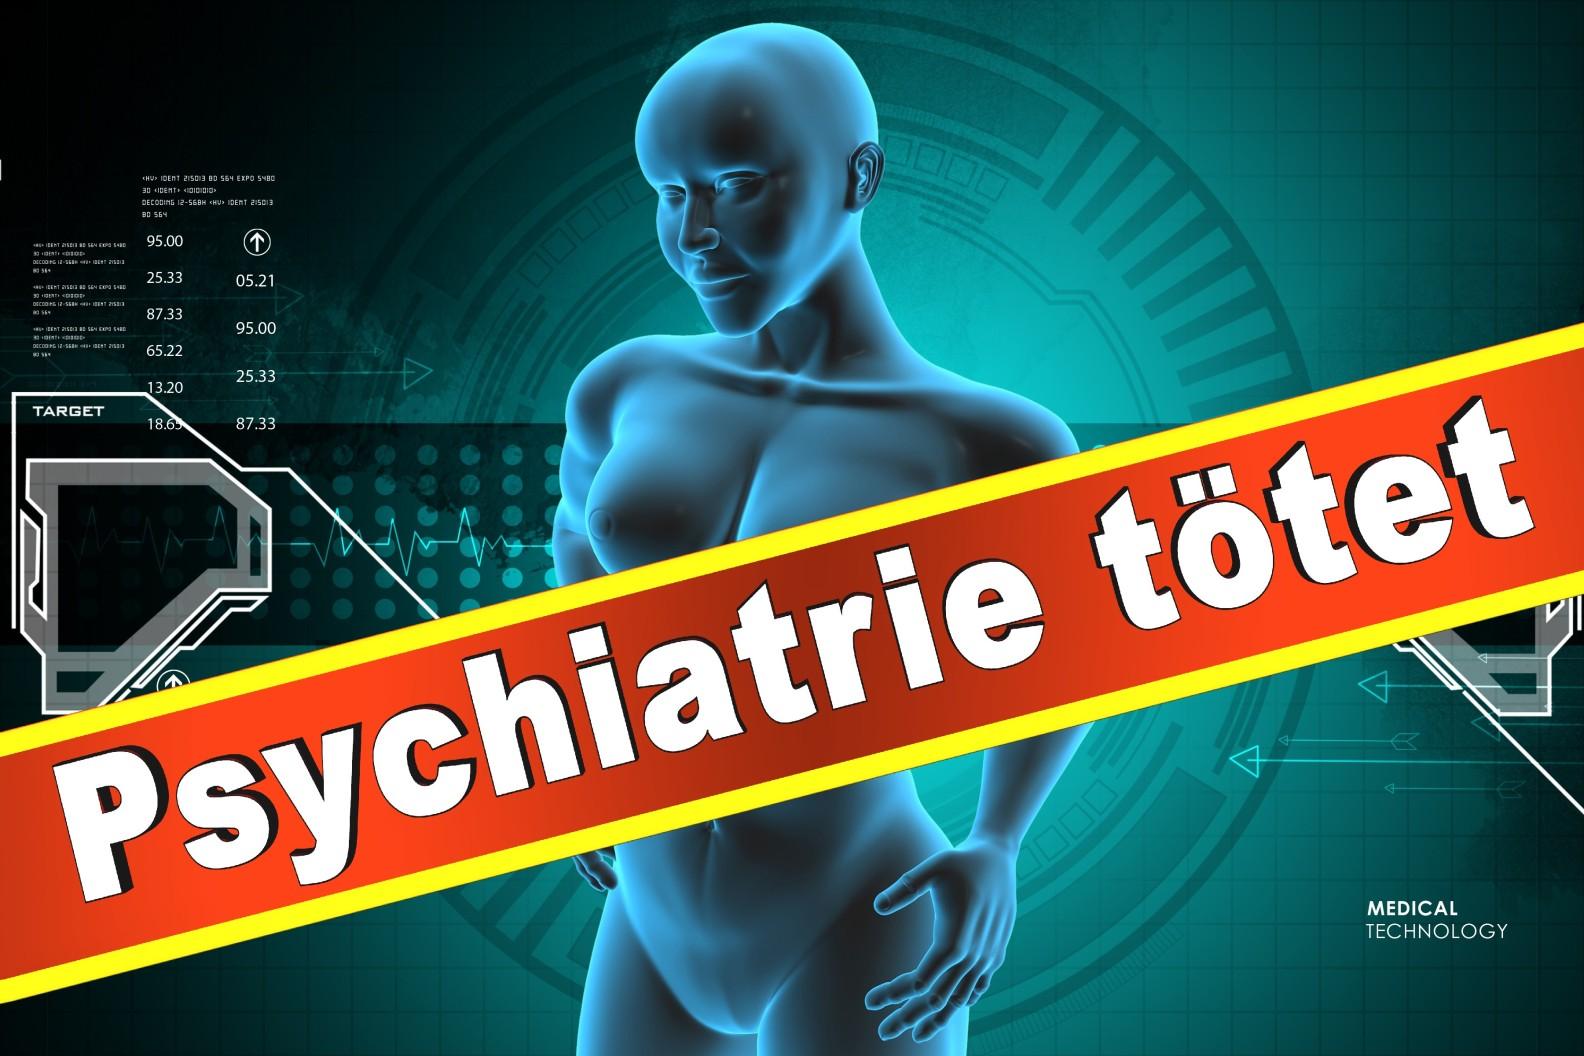 Psychiatrische Tagesklinik Nidda Bad Salzhausen Kurstr A Nidda